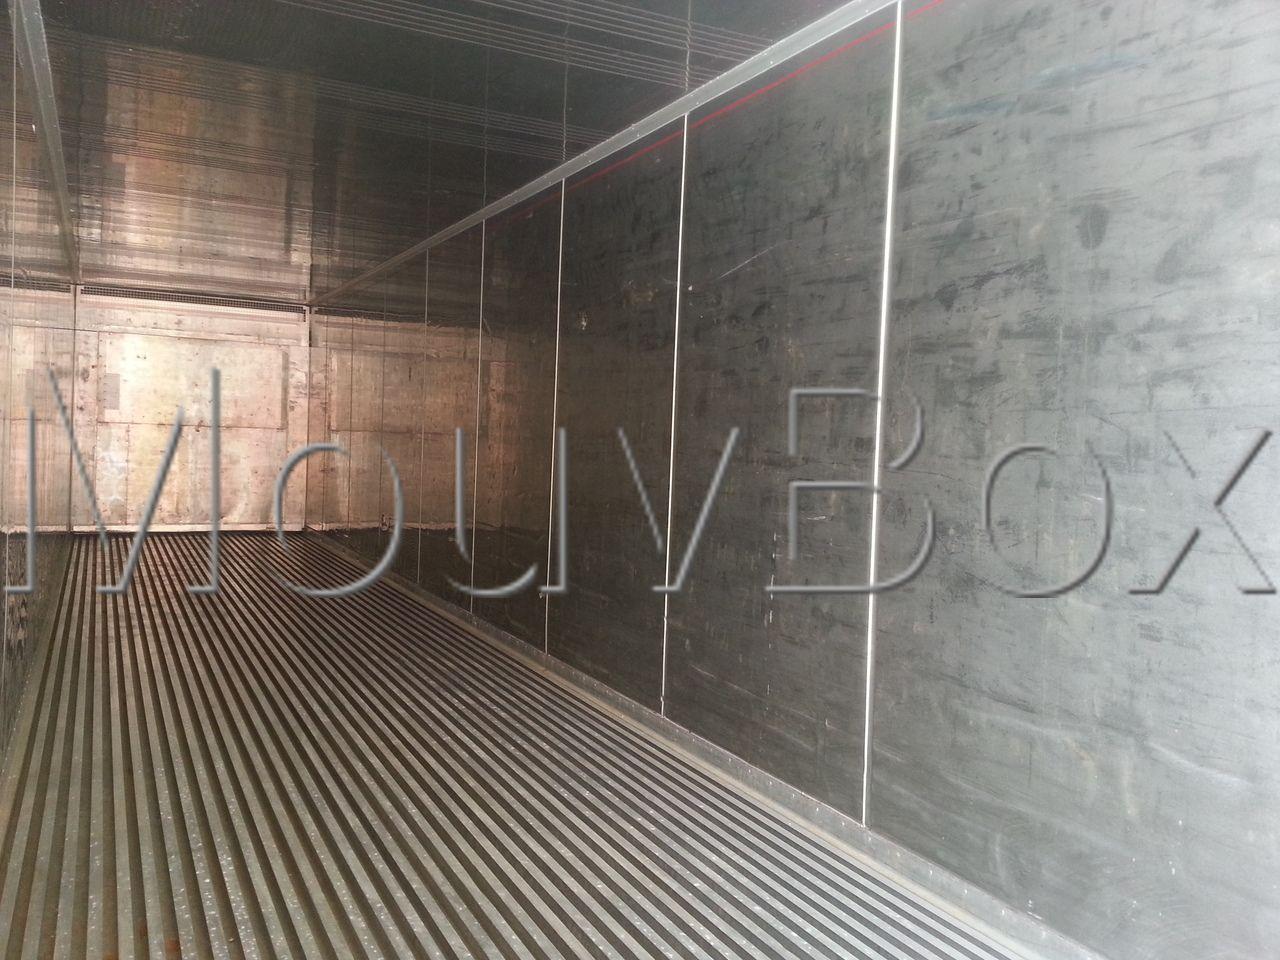 container-conteneur-box-caisson-reefer-40ft-occasion-vente-mouvbox (2)